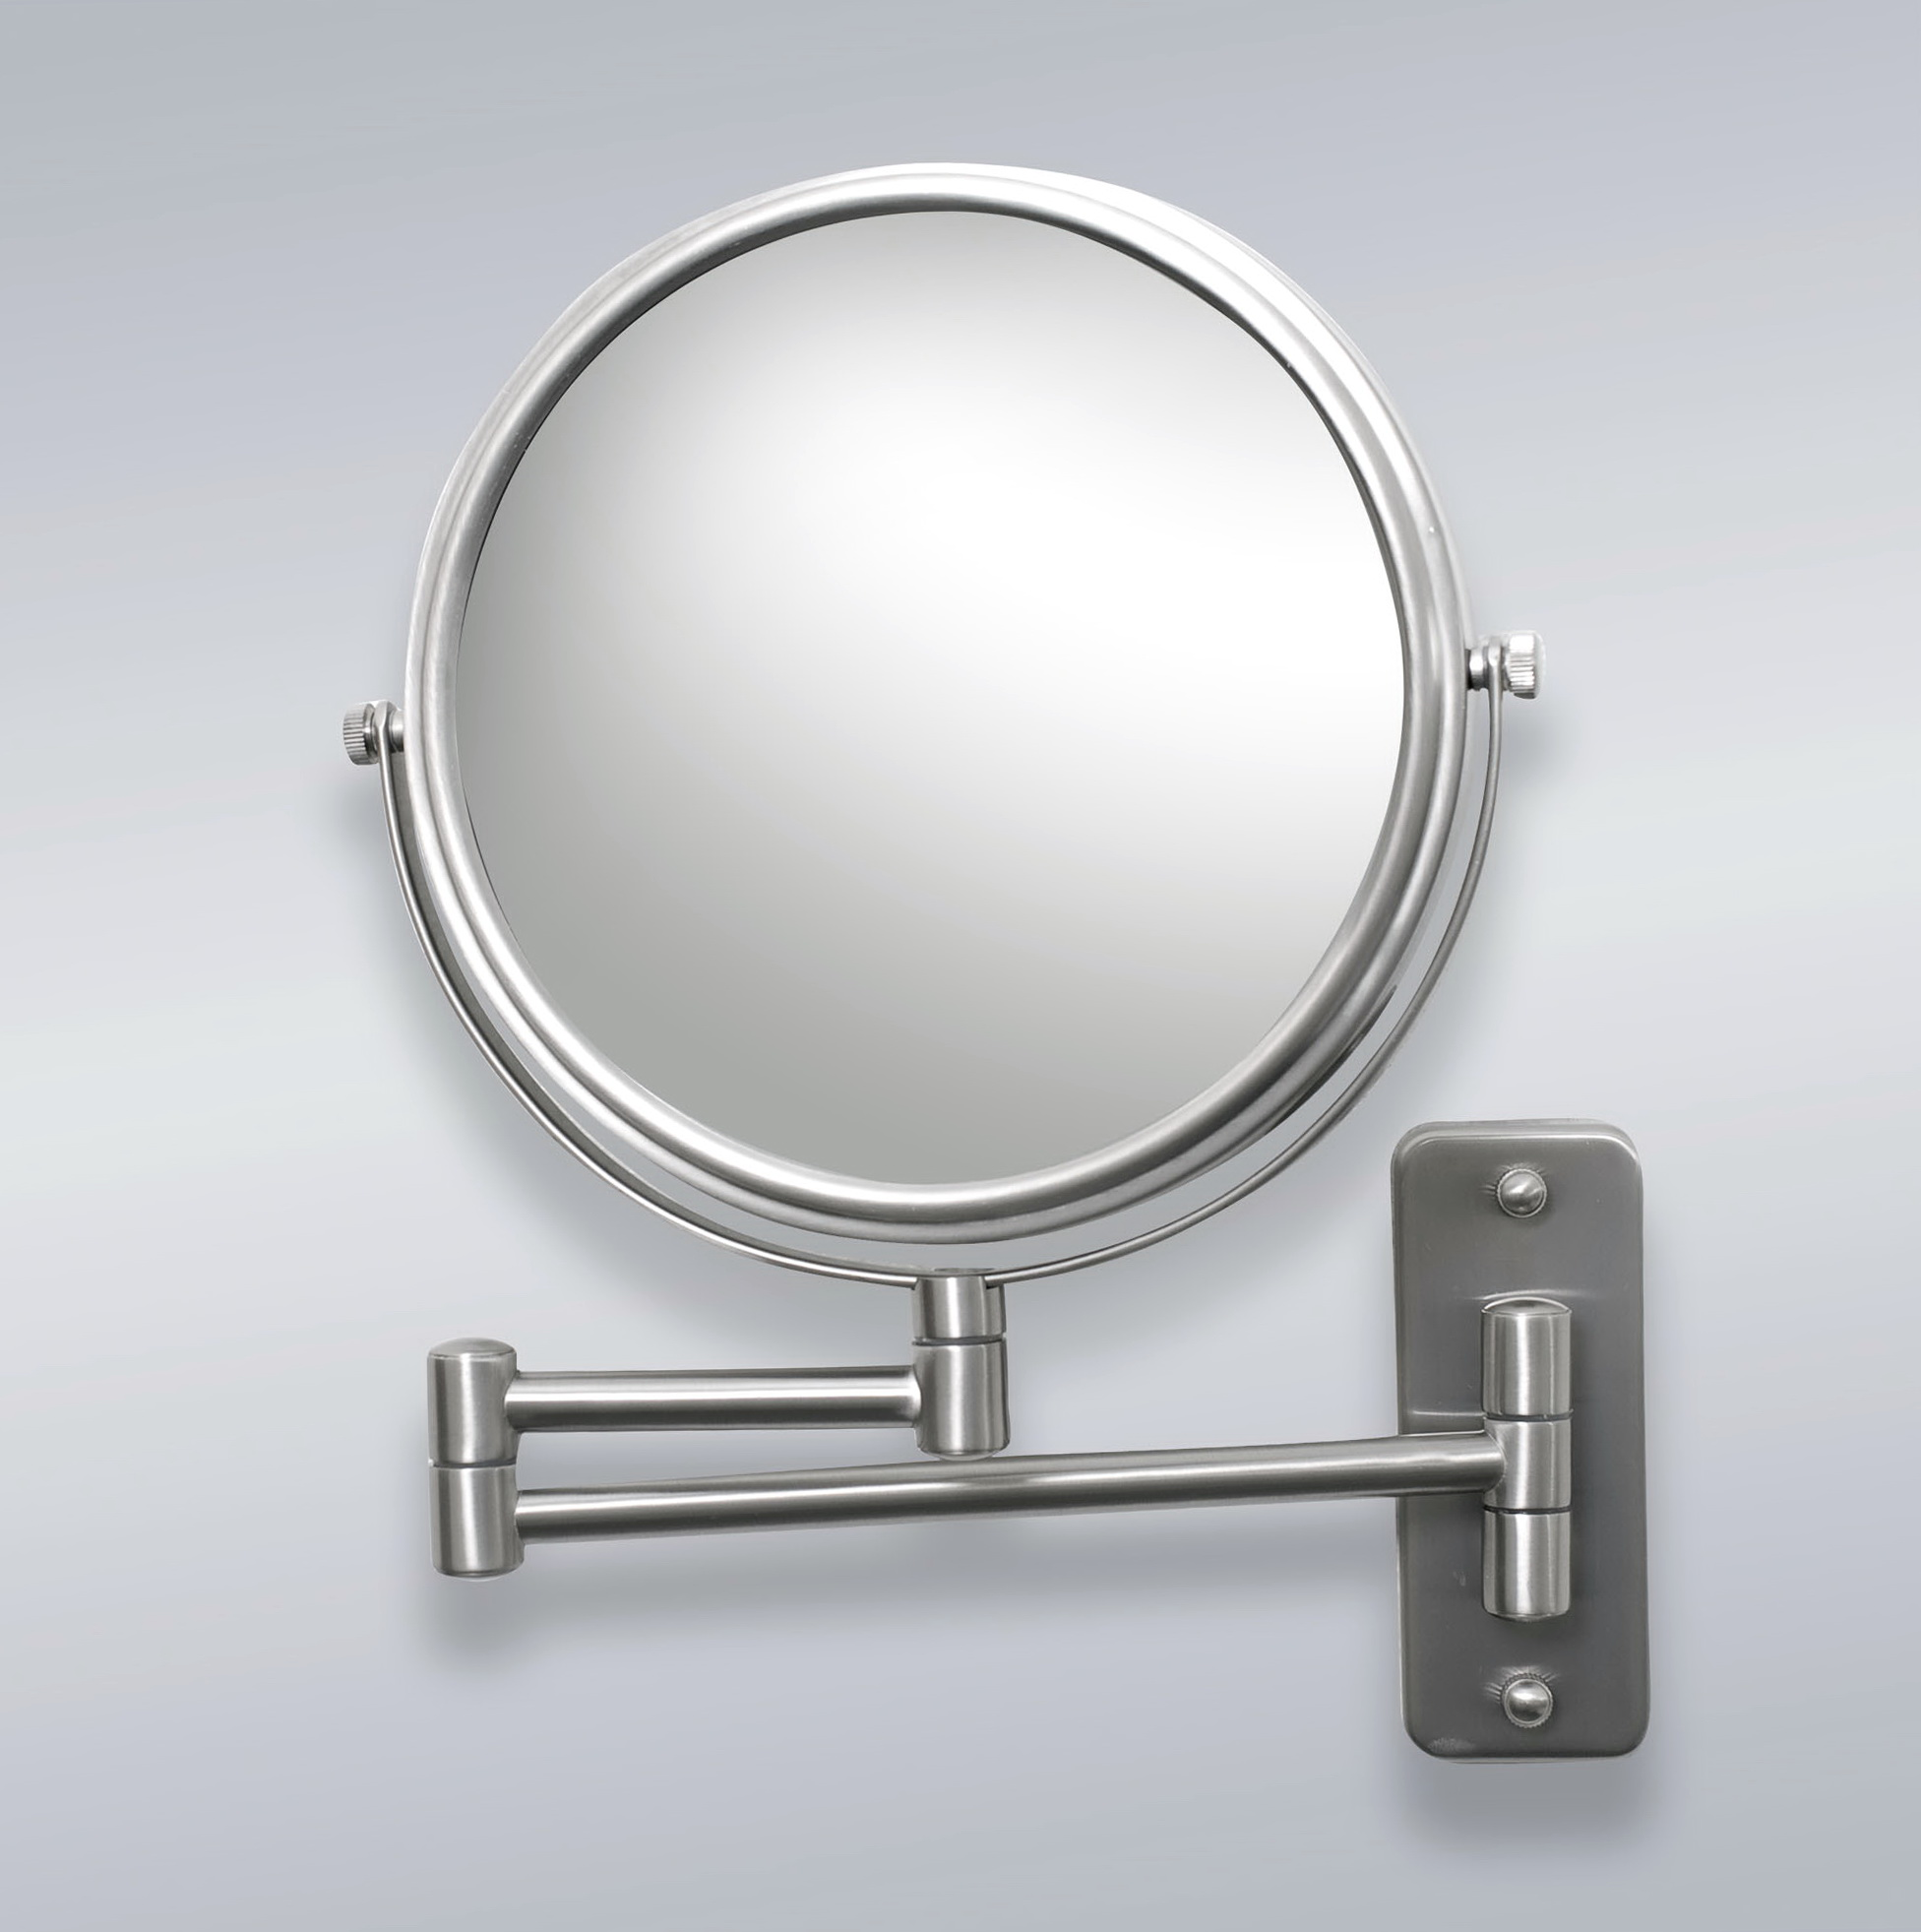 Wall Mounted Magnifying Mirror Brushed Nickel